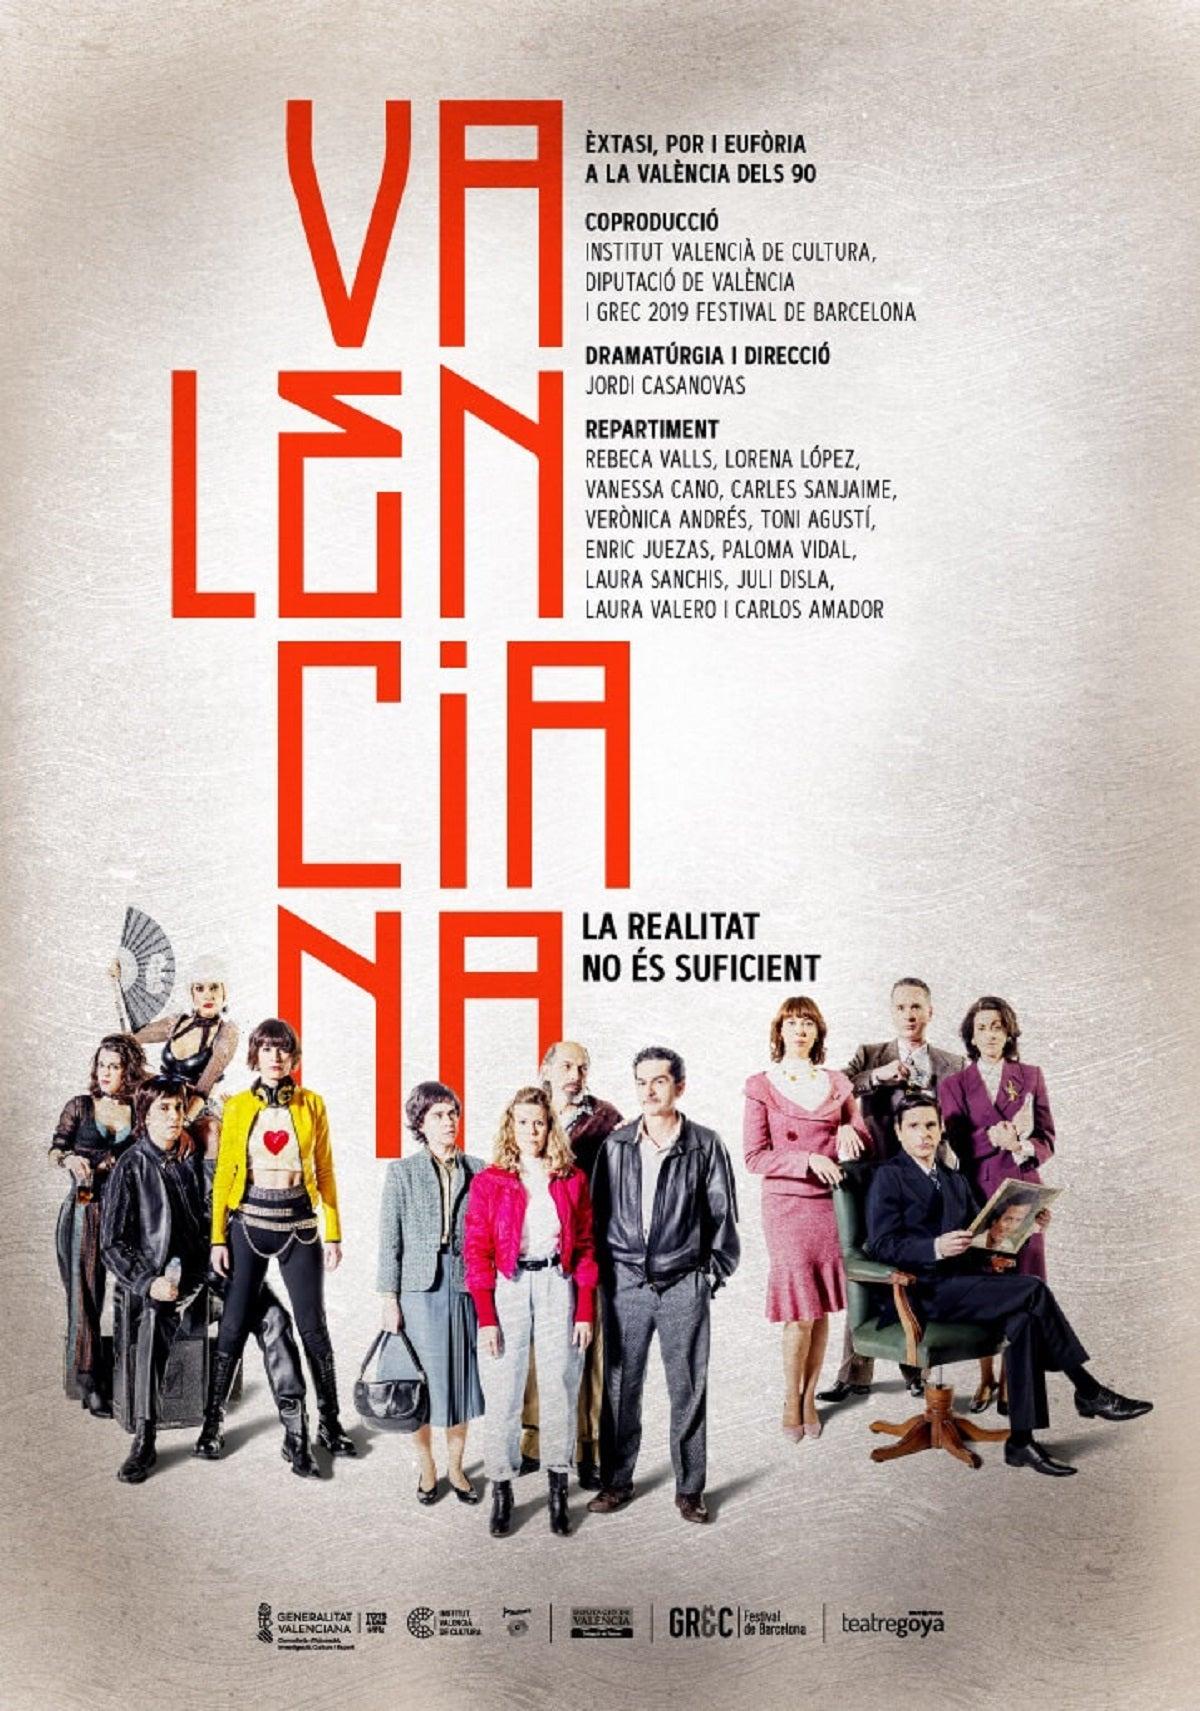 cartell-valenciana-festival-grec-teatre-goya-barcelona